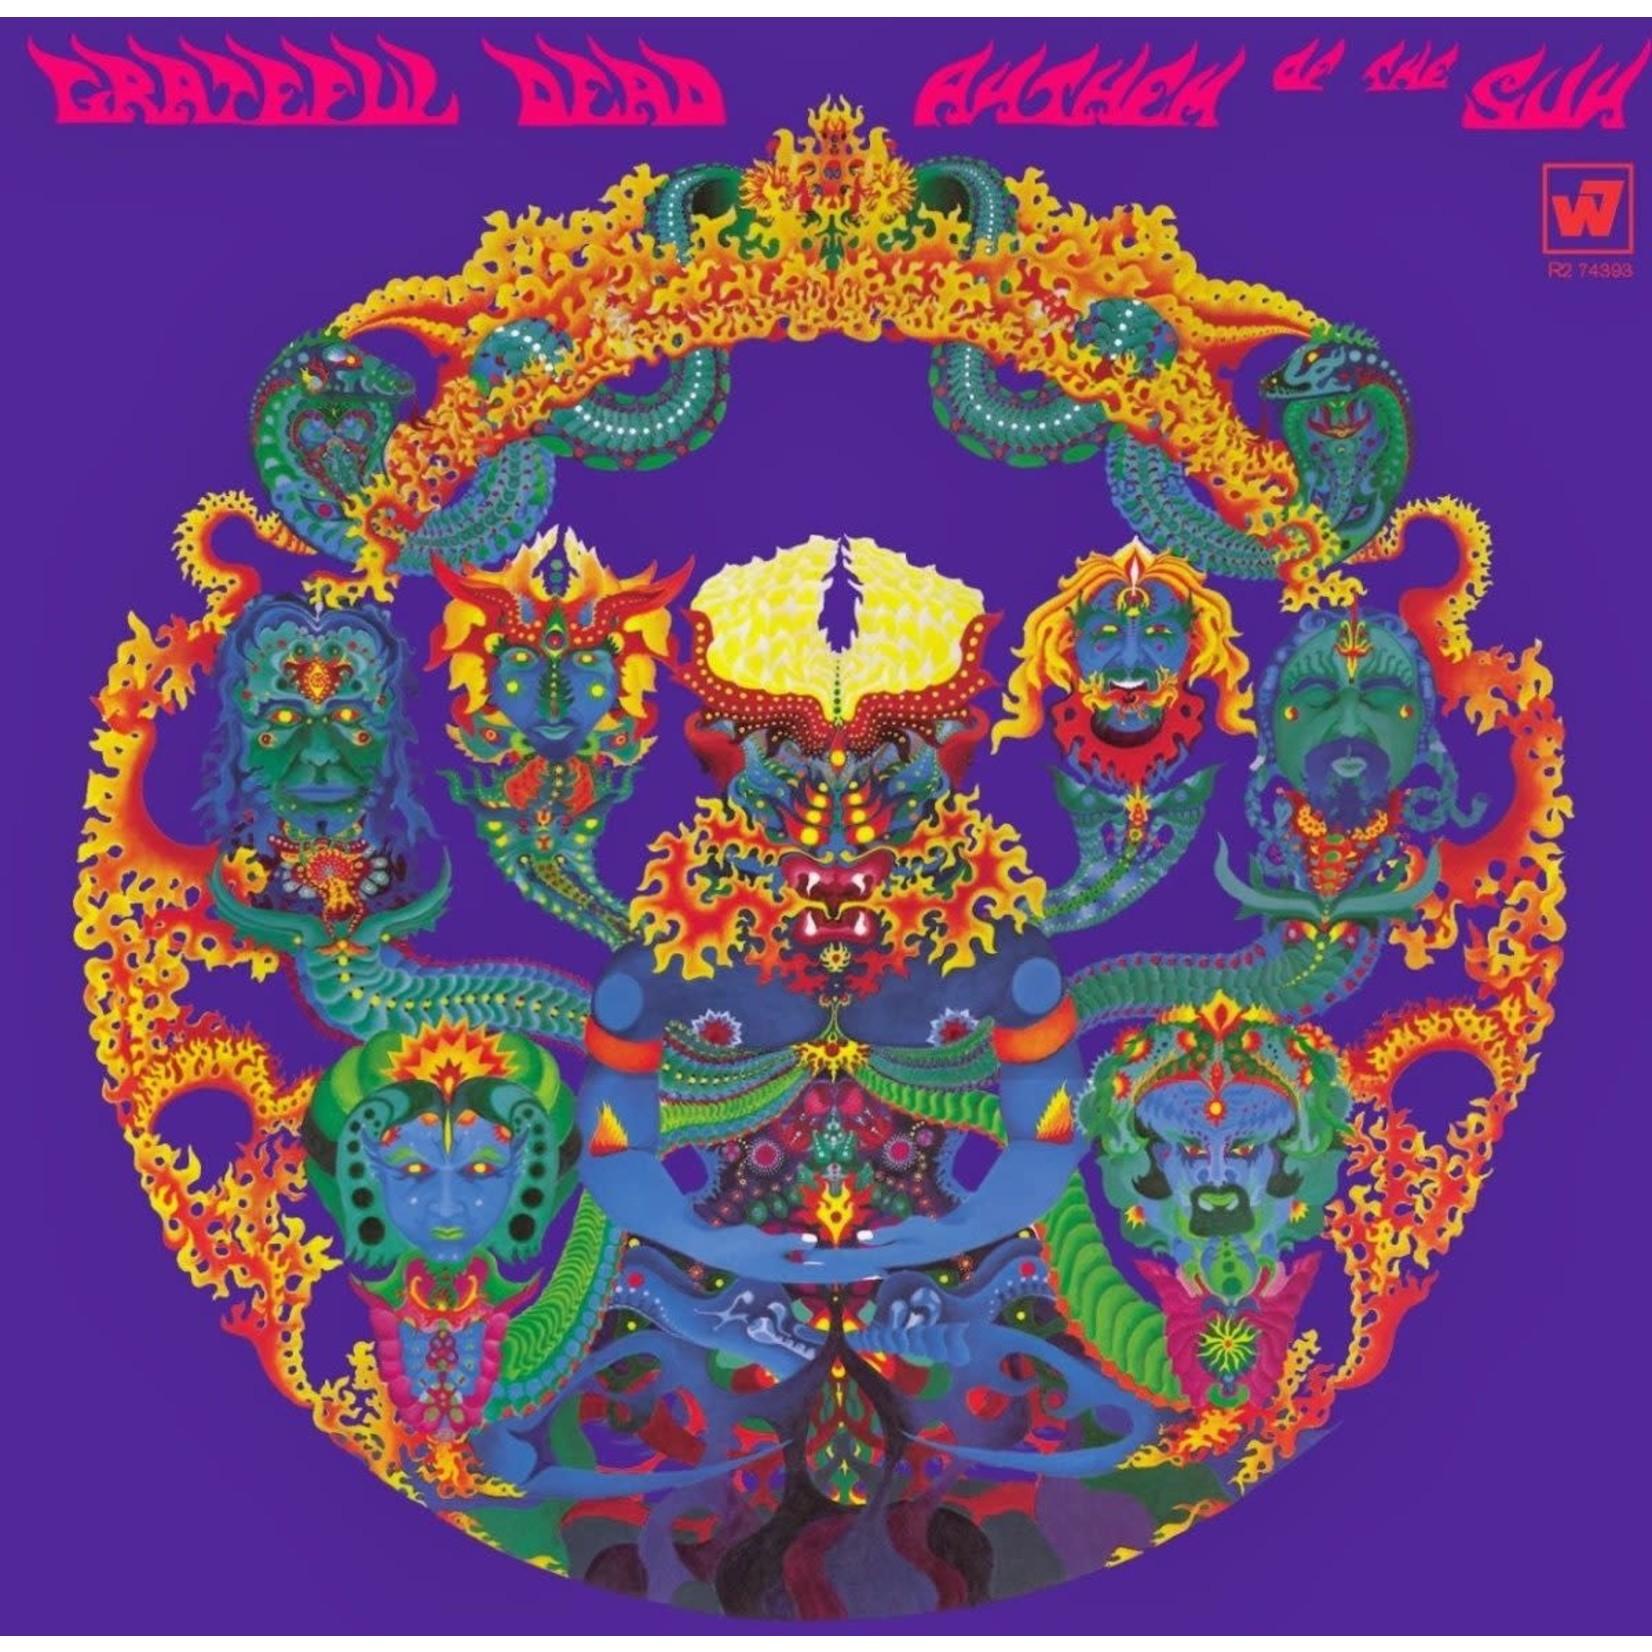 [New] Grateful Dead: Anthem Of The Sun